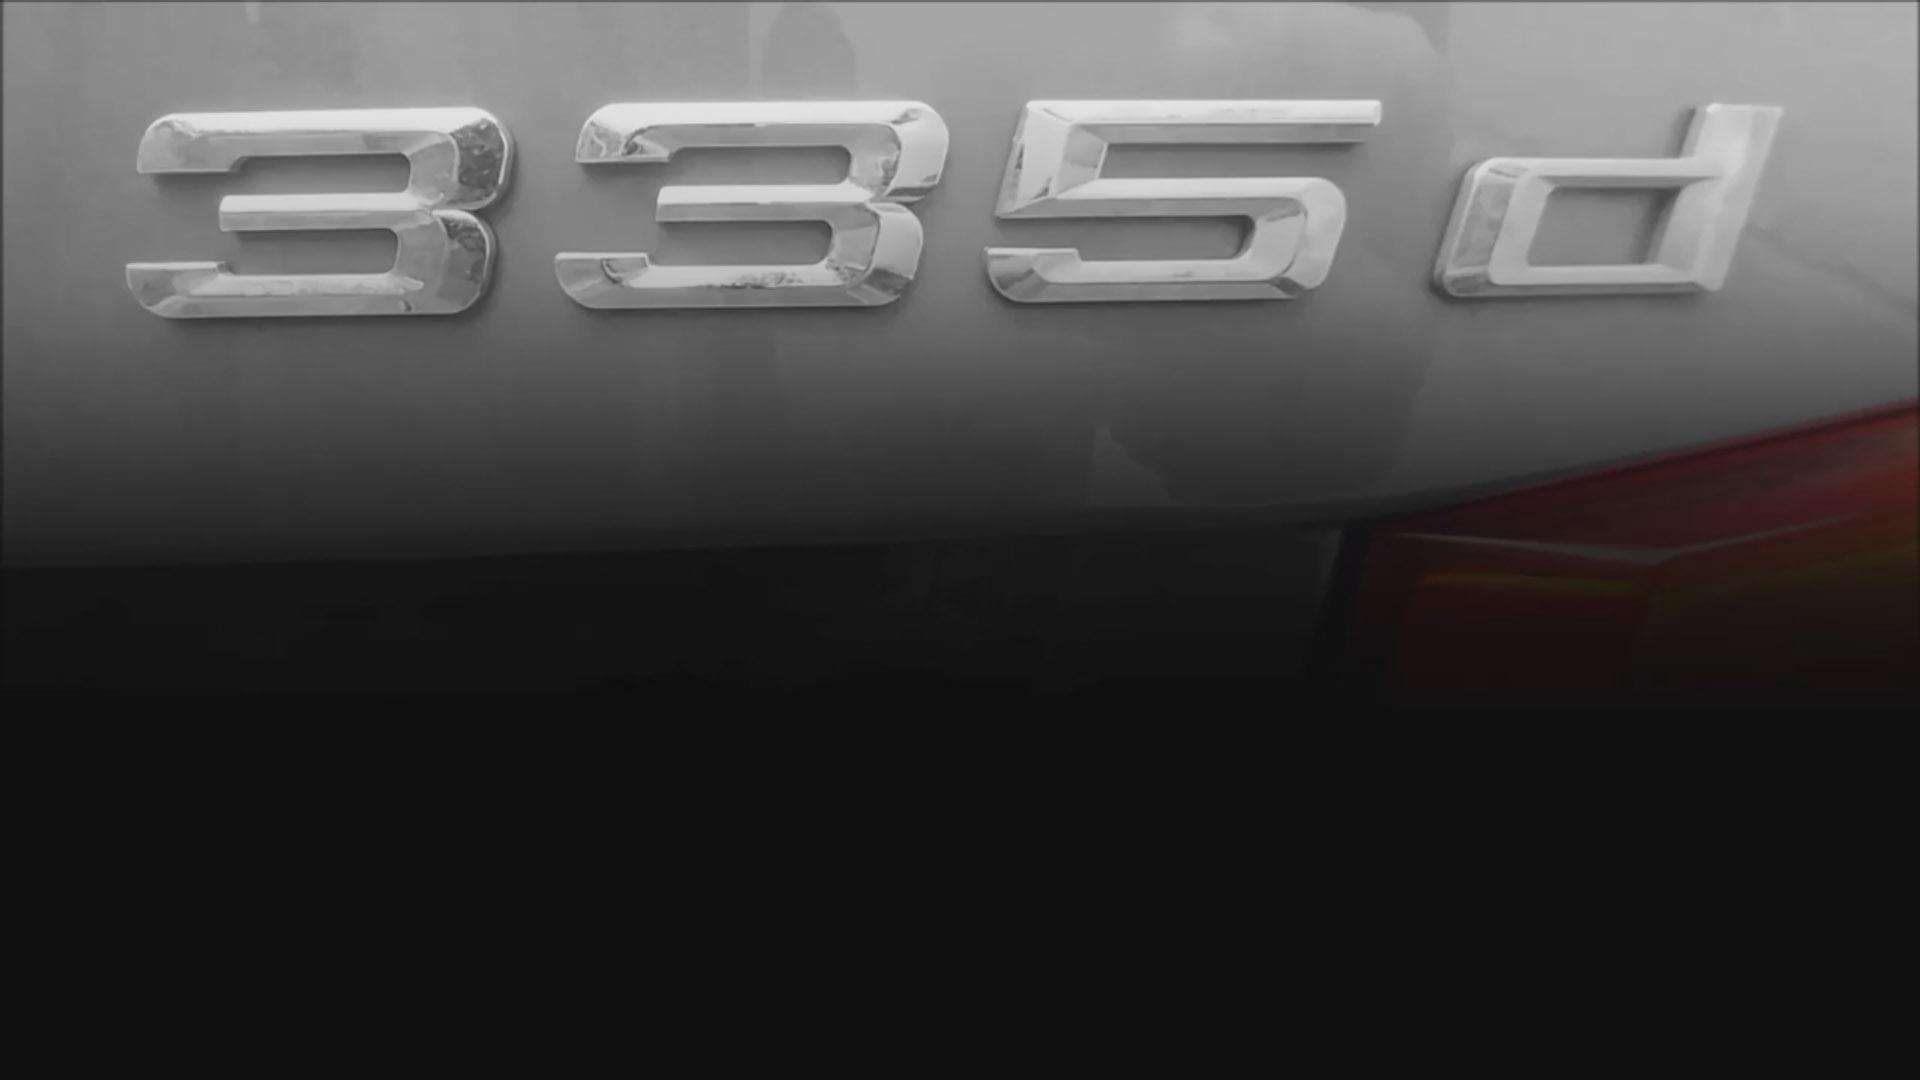 0 62mph Times Of The Bmw 335d X Drive M Sport Diesel